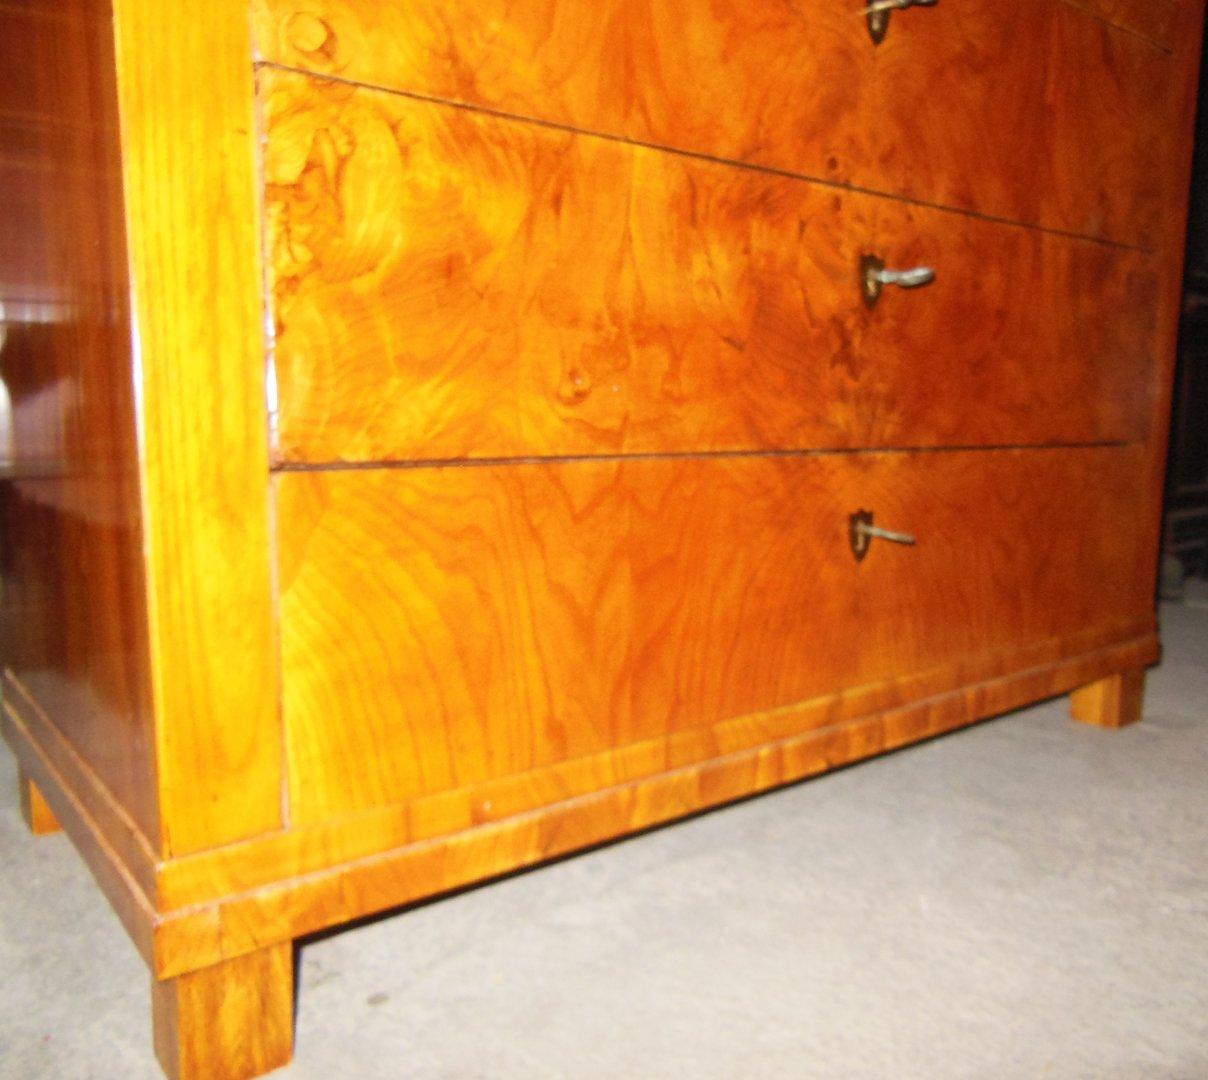 deutscher schreibsekret r schreibschrank biedermeier sekret r um 1830 antik m bel antiquit ten. Black Bedroom Furniture Sets. Home Design Ideas